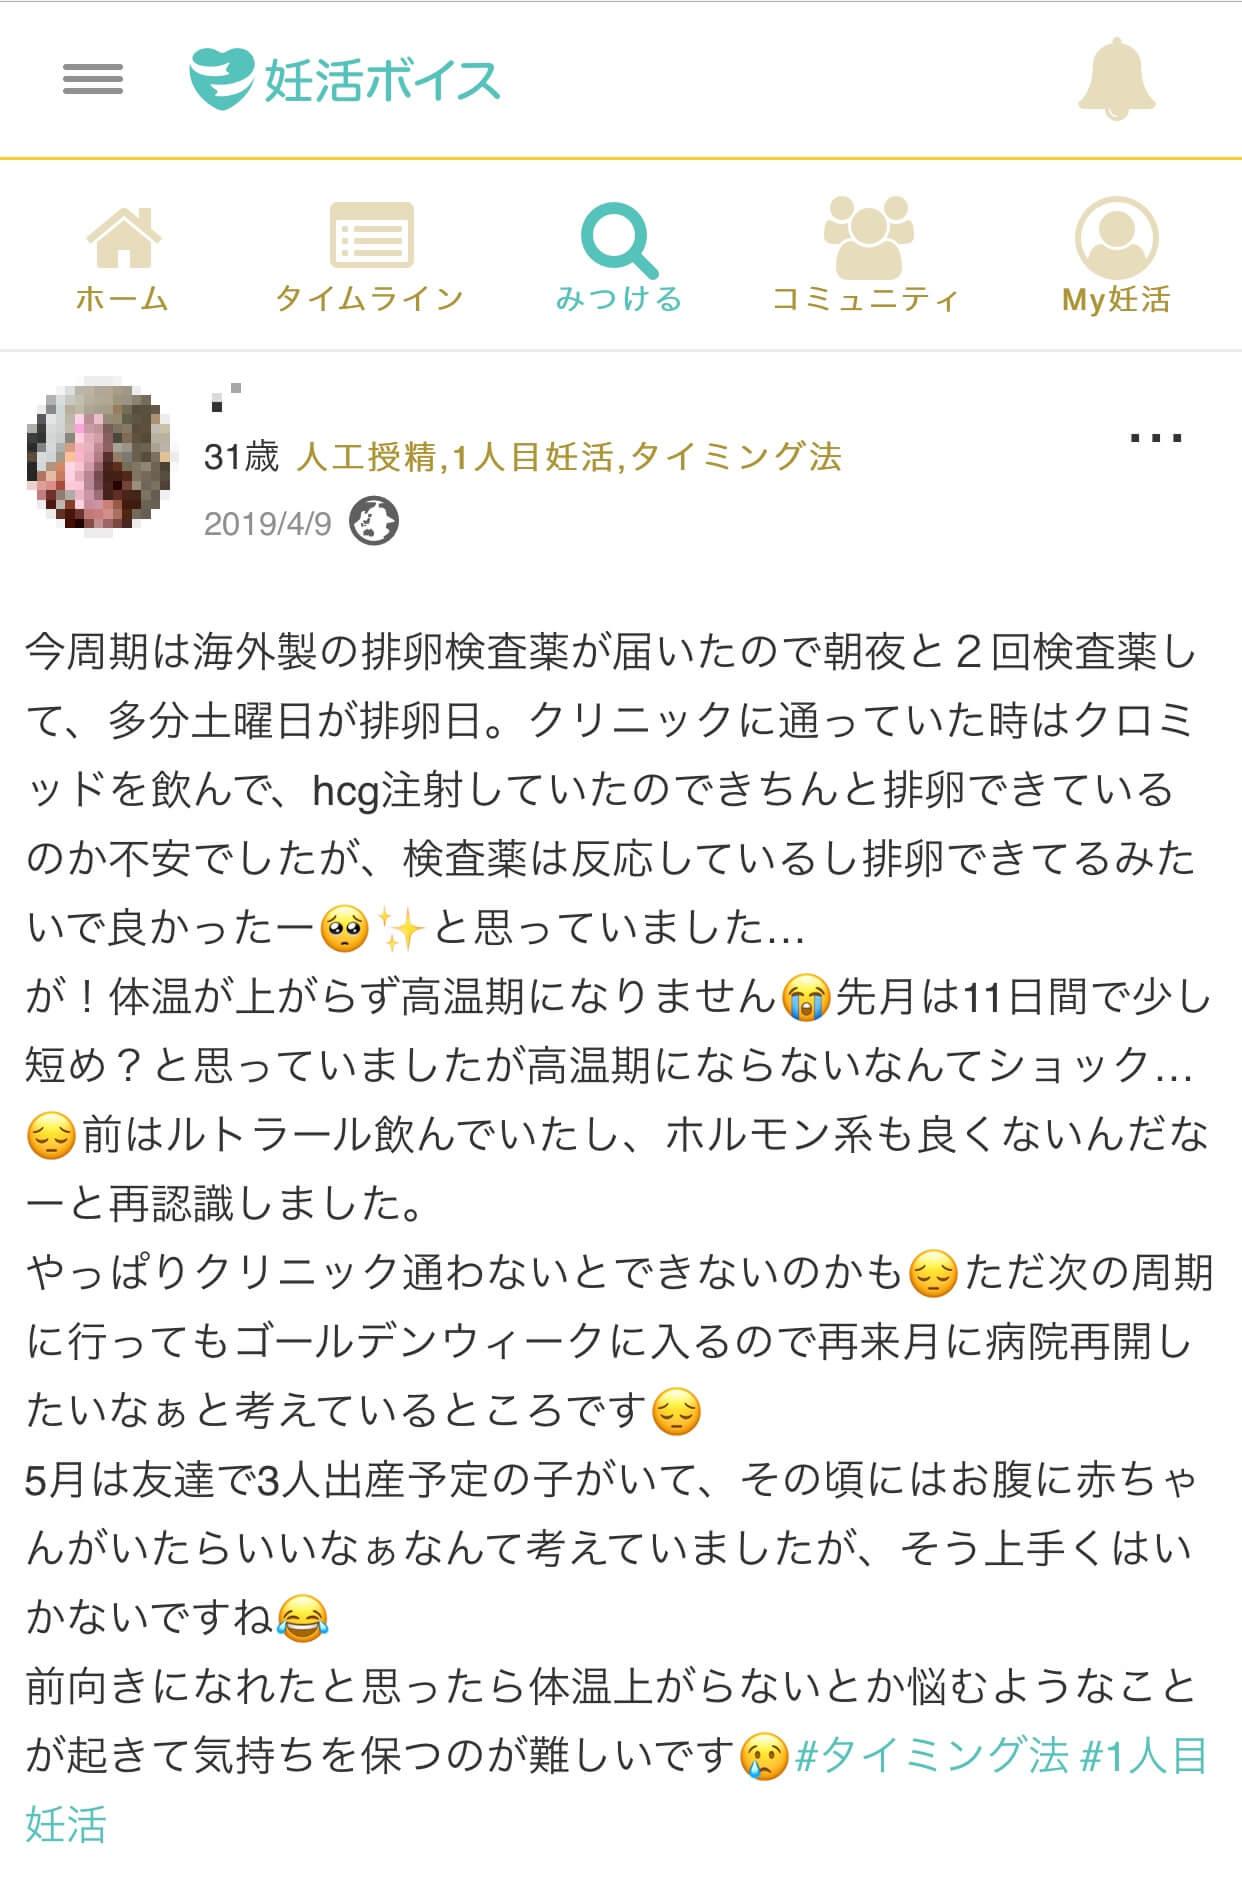 Tさん(31歳・1人目妊活・タイミング法・人工授精)